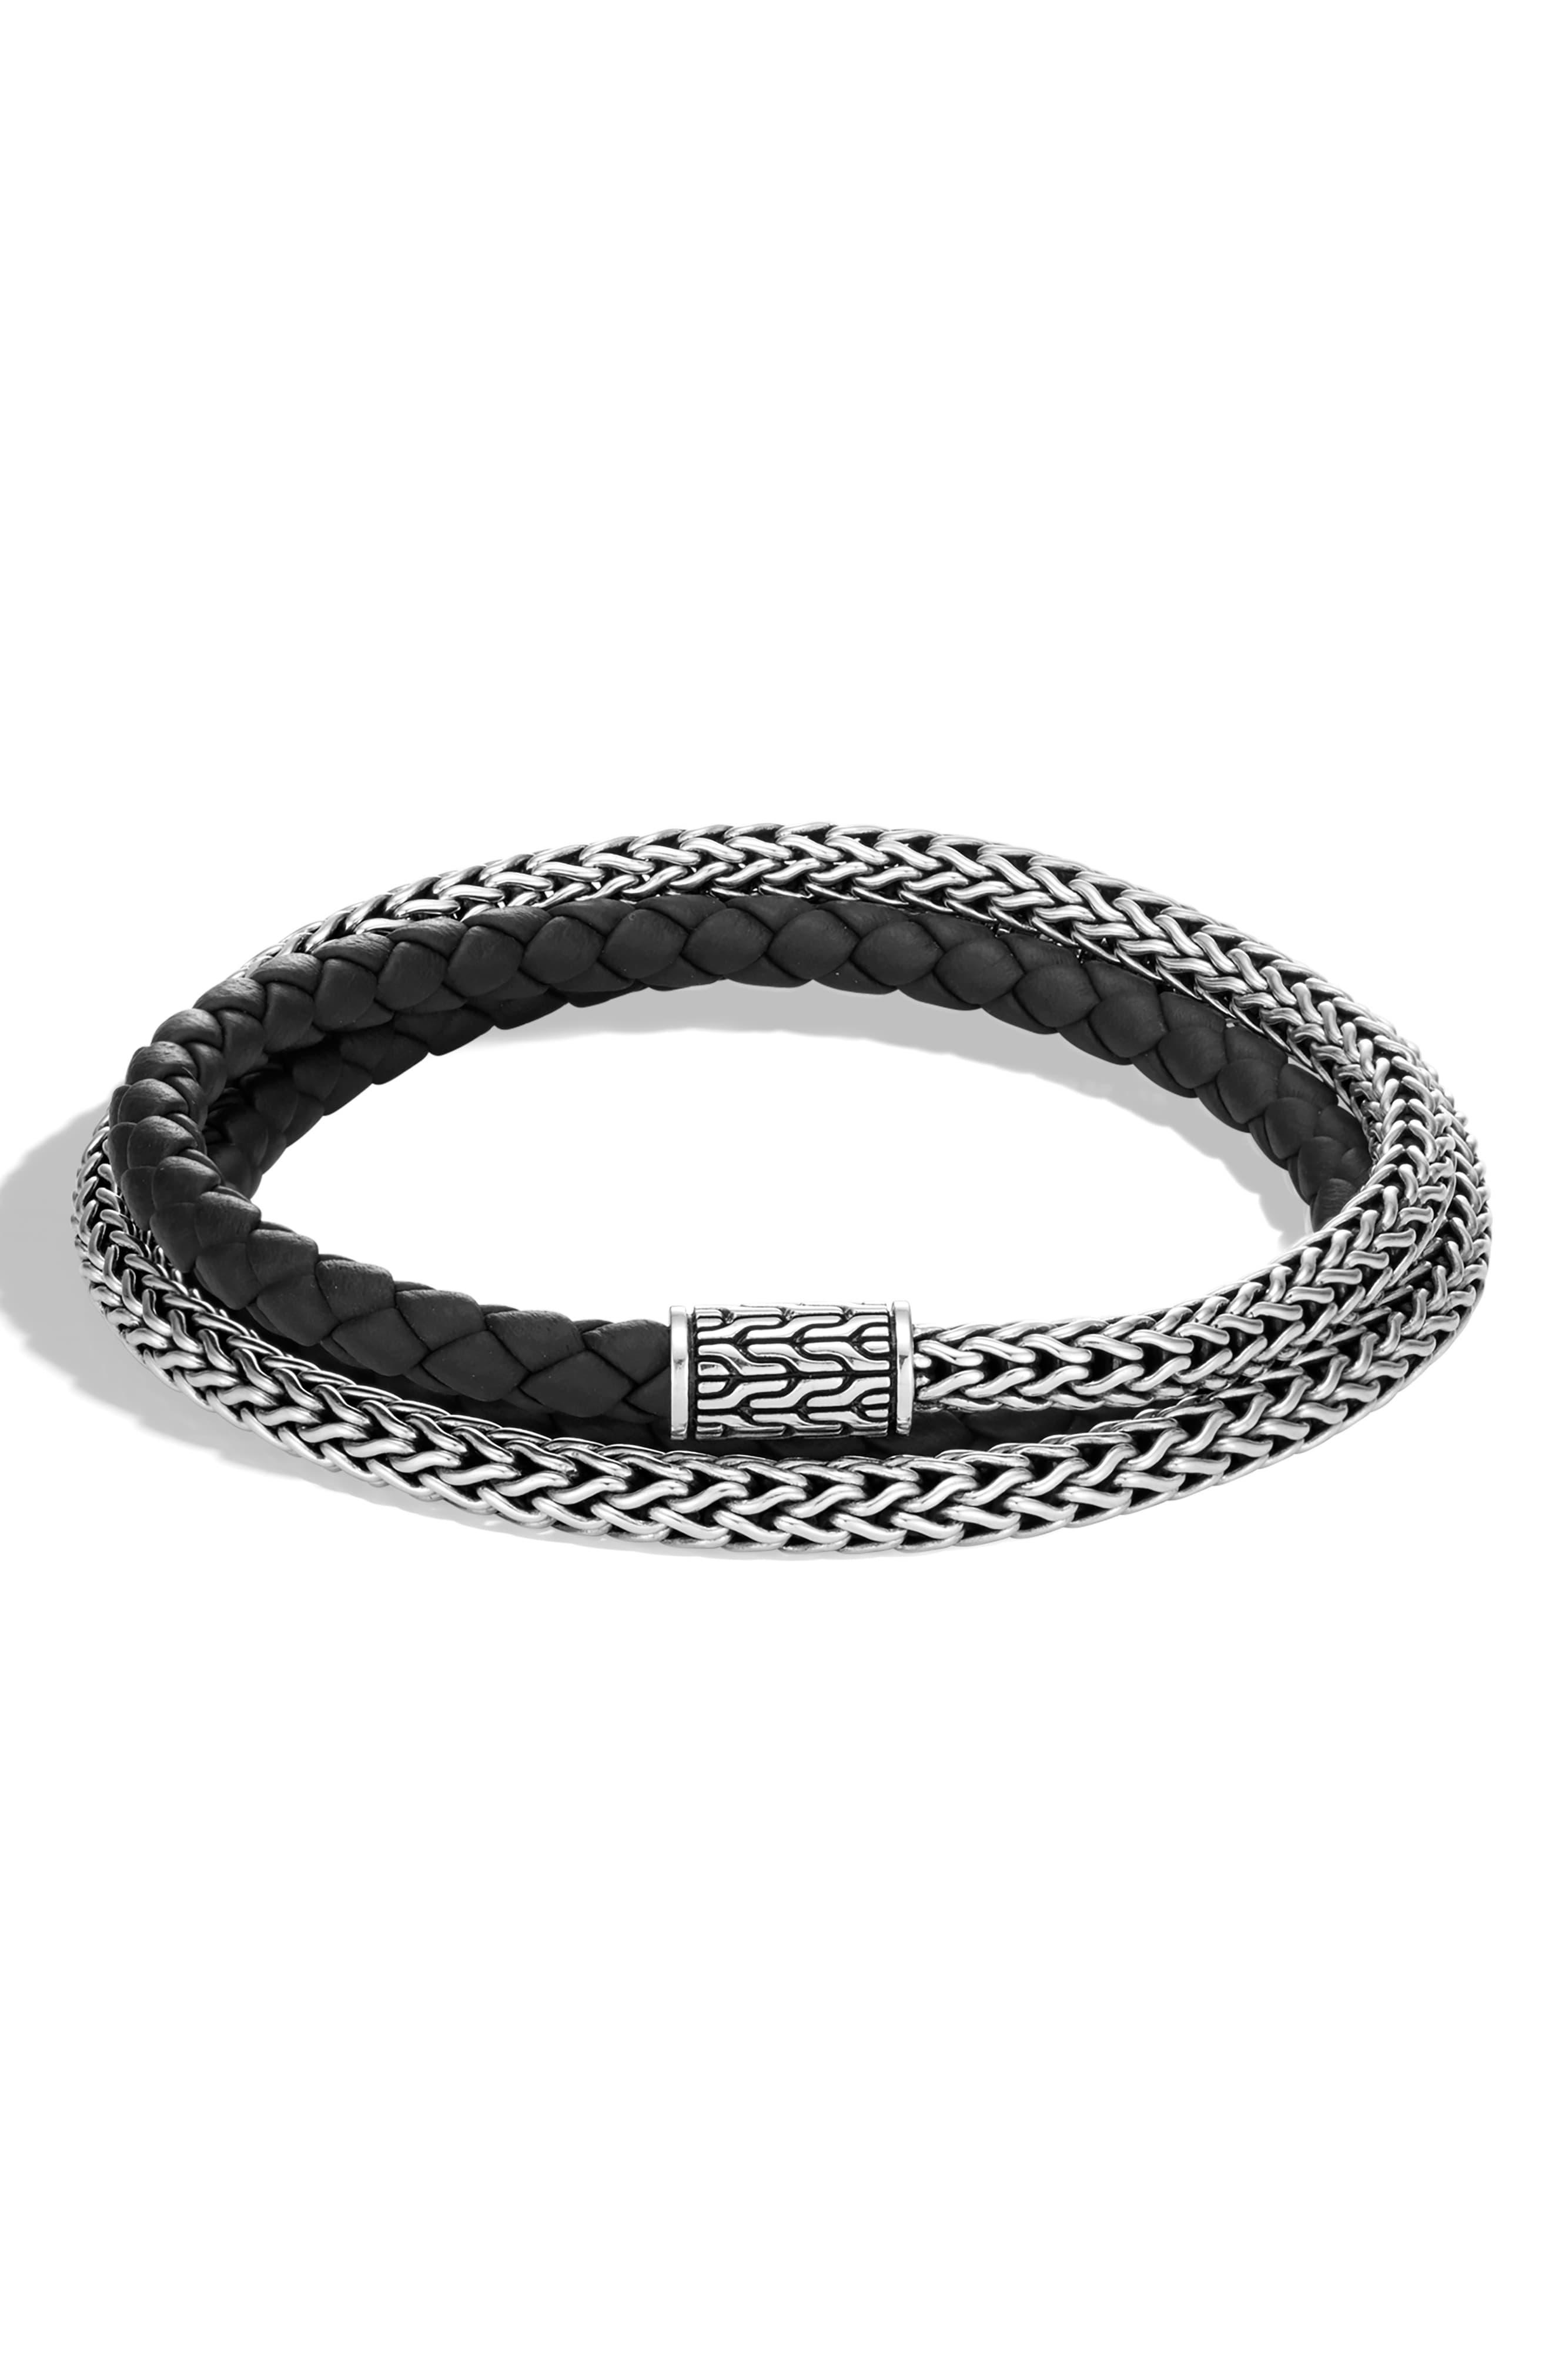 John Hardy Men S Classic Chain Double Wrap Bracelet Bracelets John Hardy Bracelets For Men